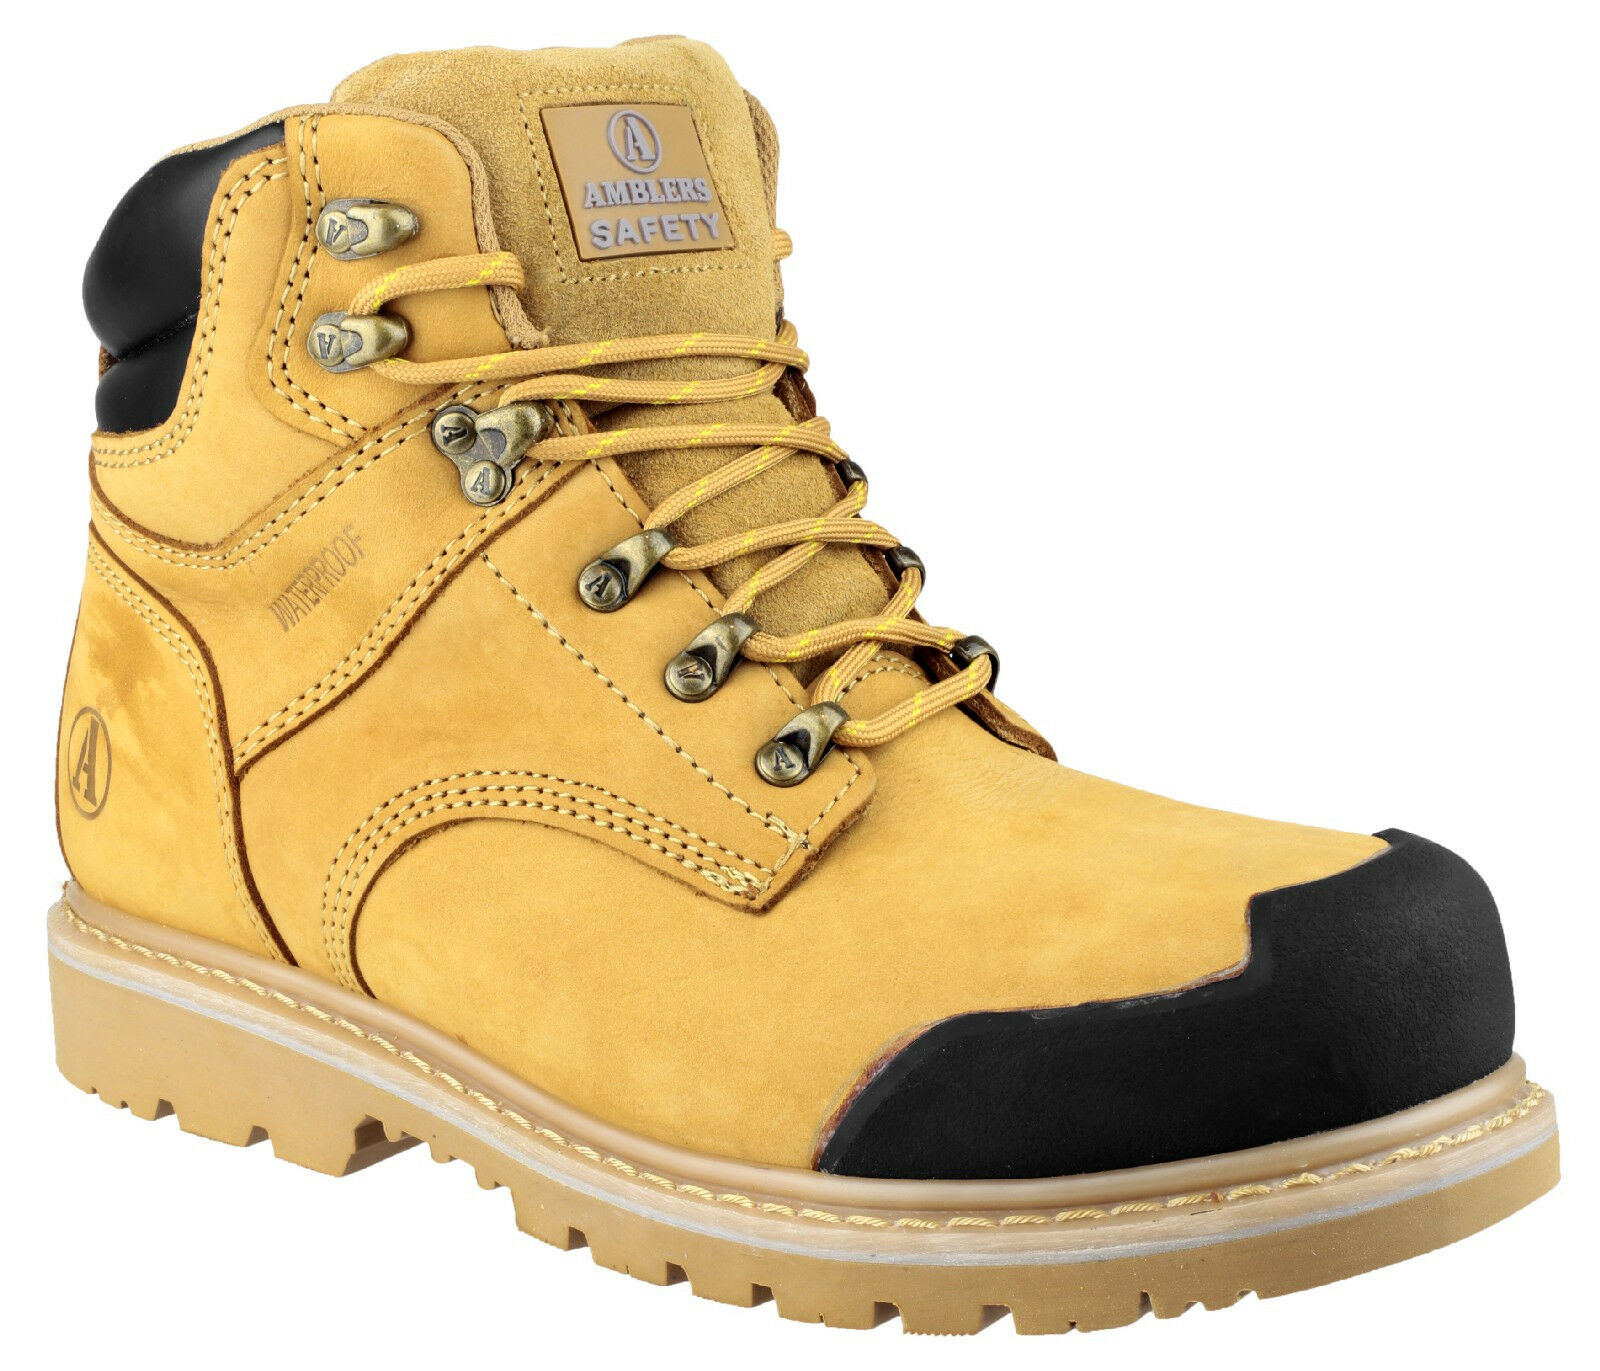 Linea Uomo Impermeabili Stivali di Sicurezza/Tan Brown Boots in acciaio Puntale Work Boots Brown laced Amblers d31933